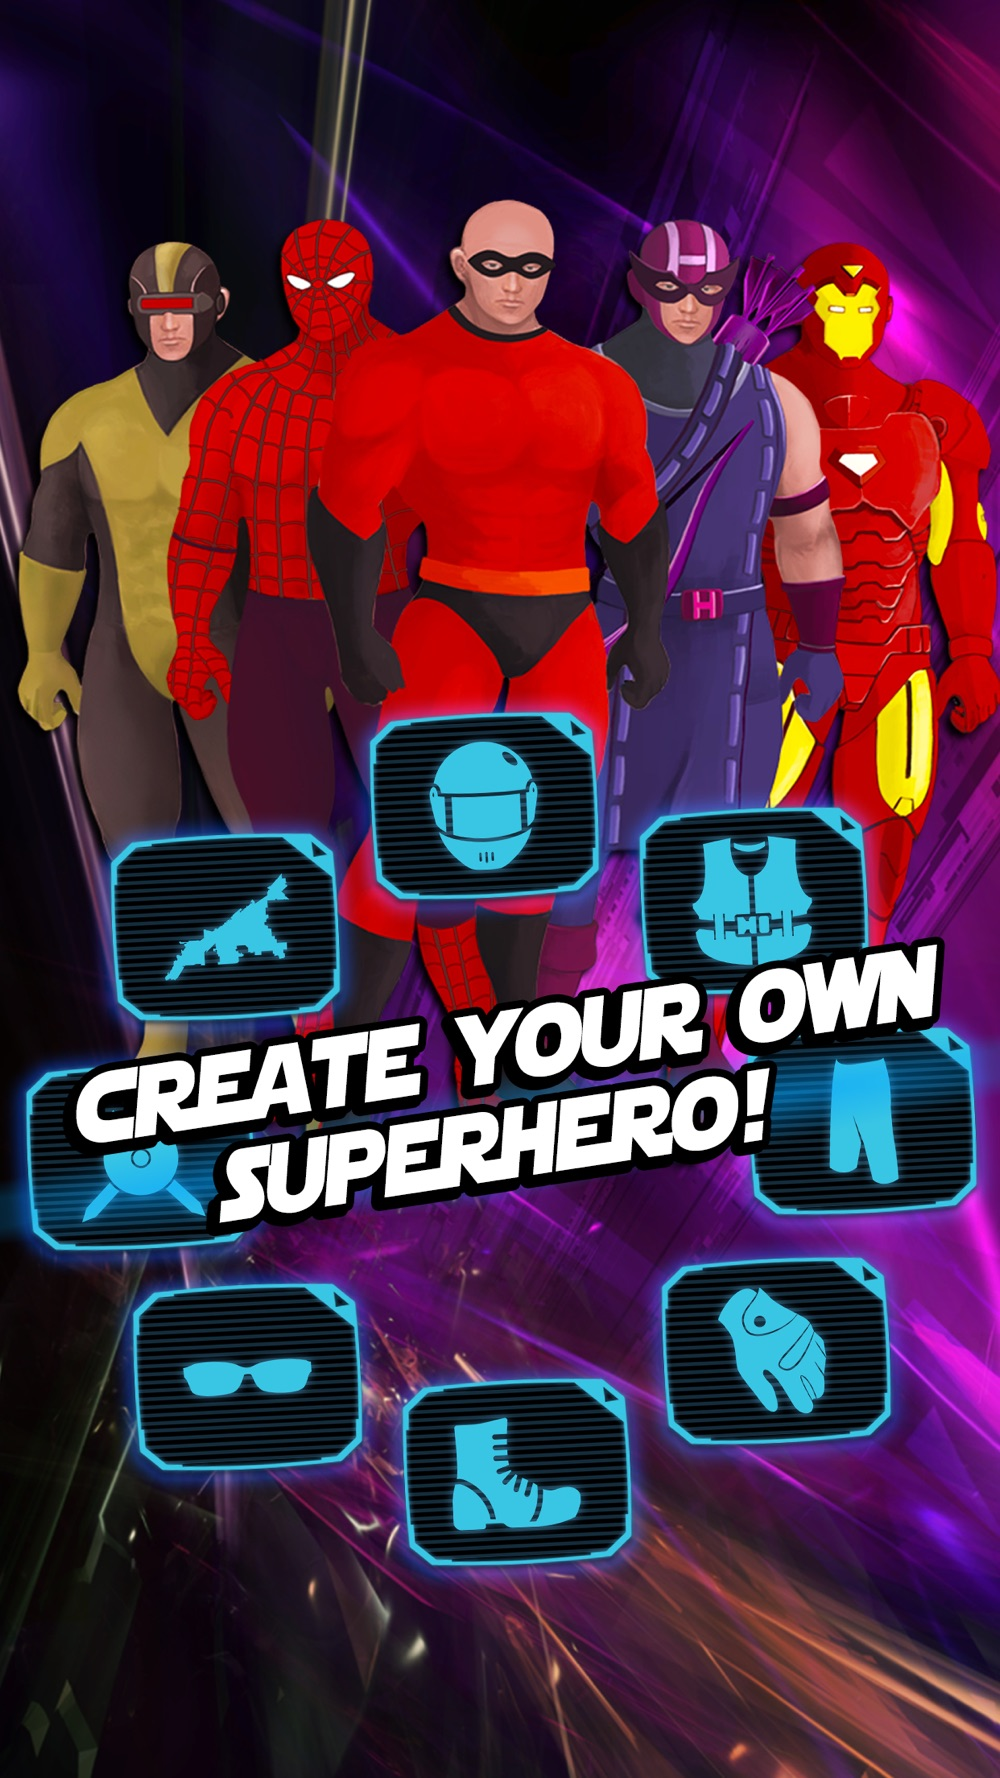 Superhero Creator – Super Hero Character Costume Maker & Dress Up Game for Man FREE Cheat Codes